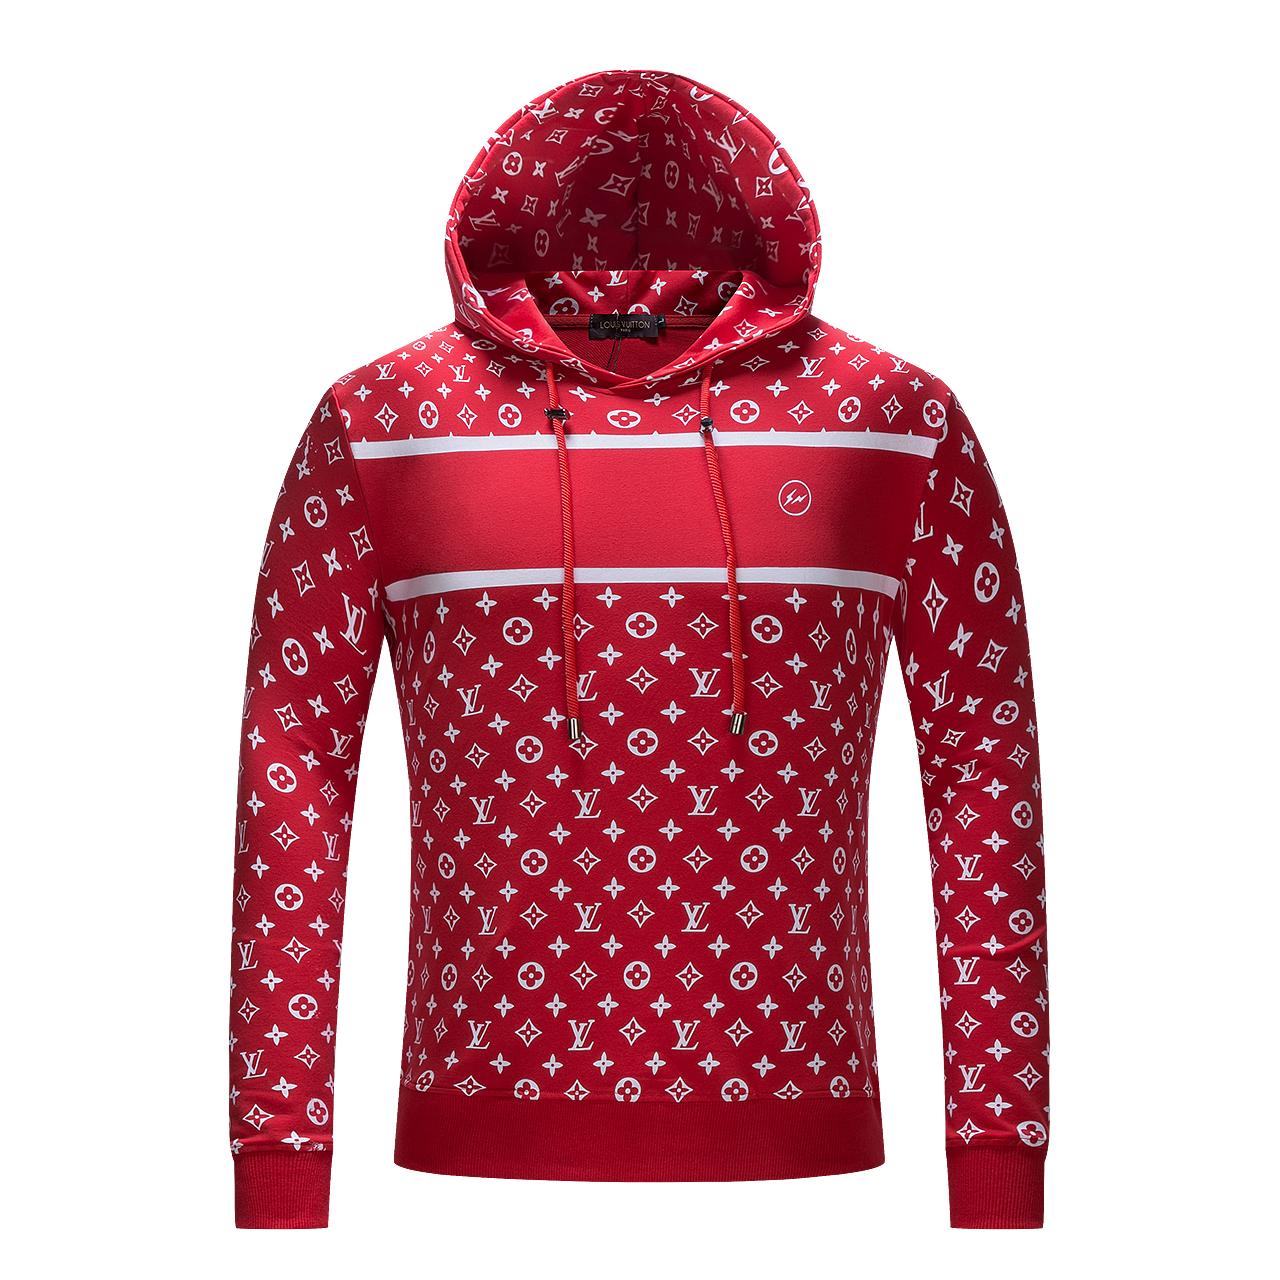 SUPREM X LV Logo Sweatshirt Red Hooded